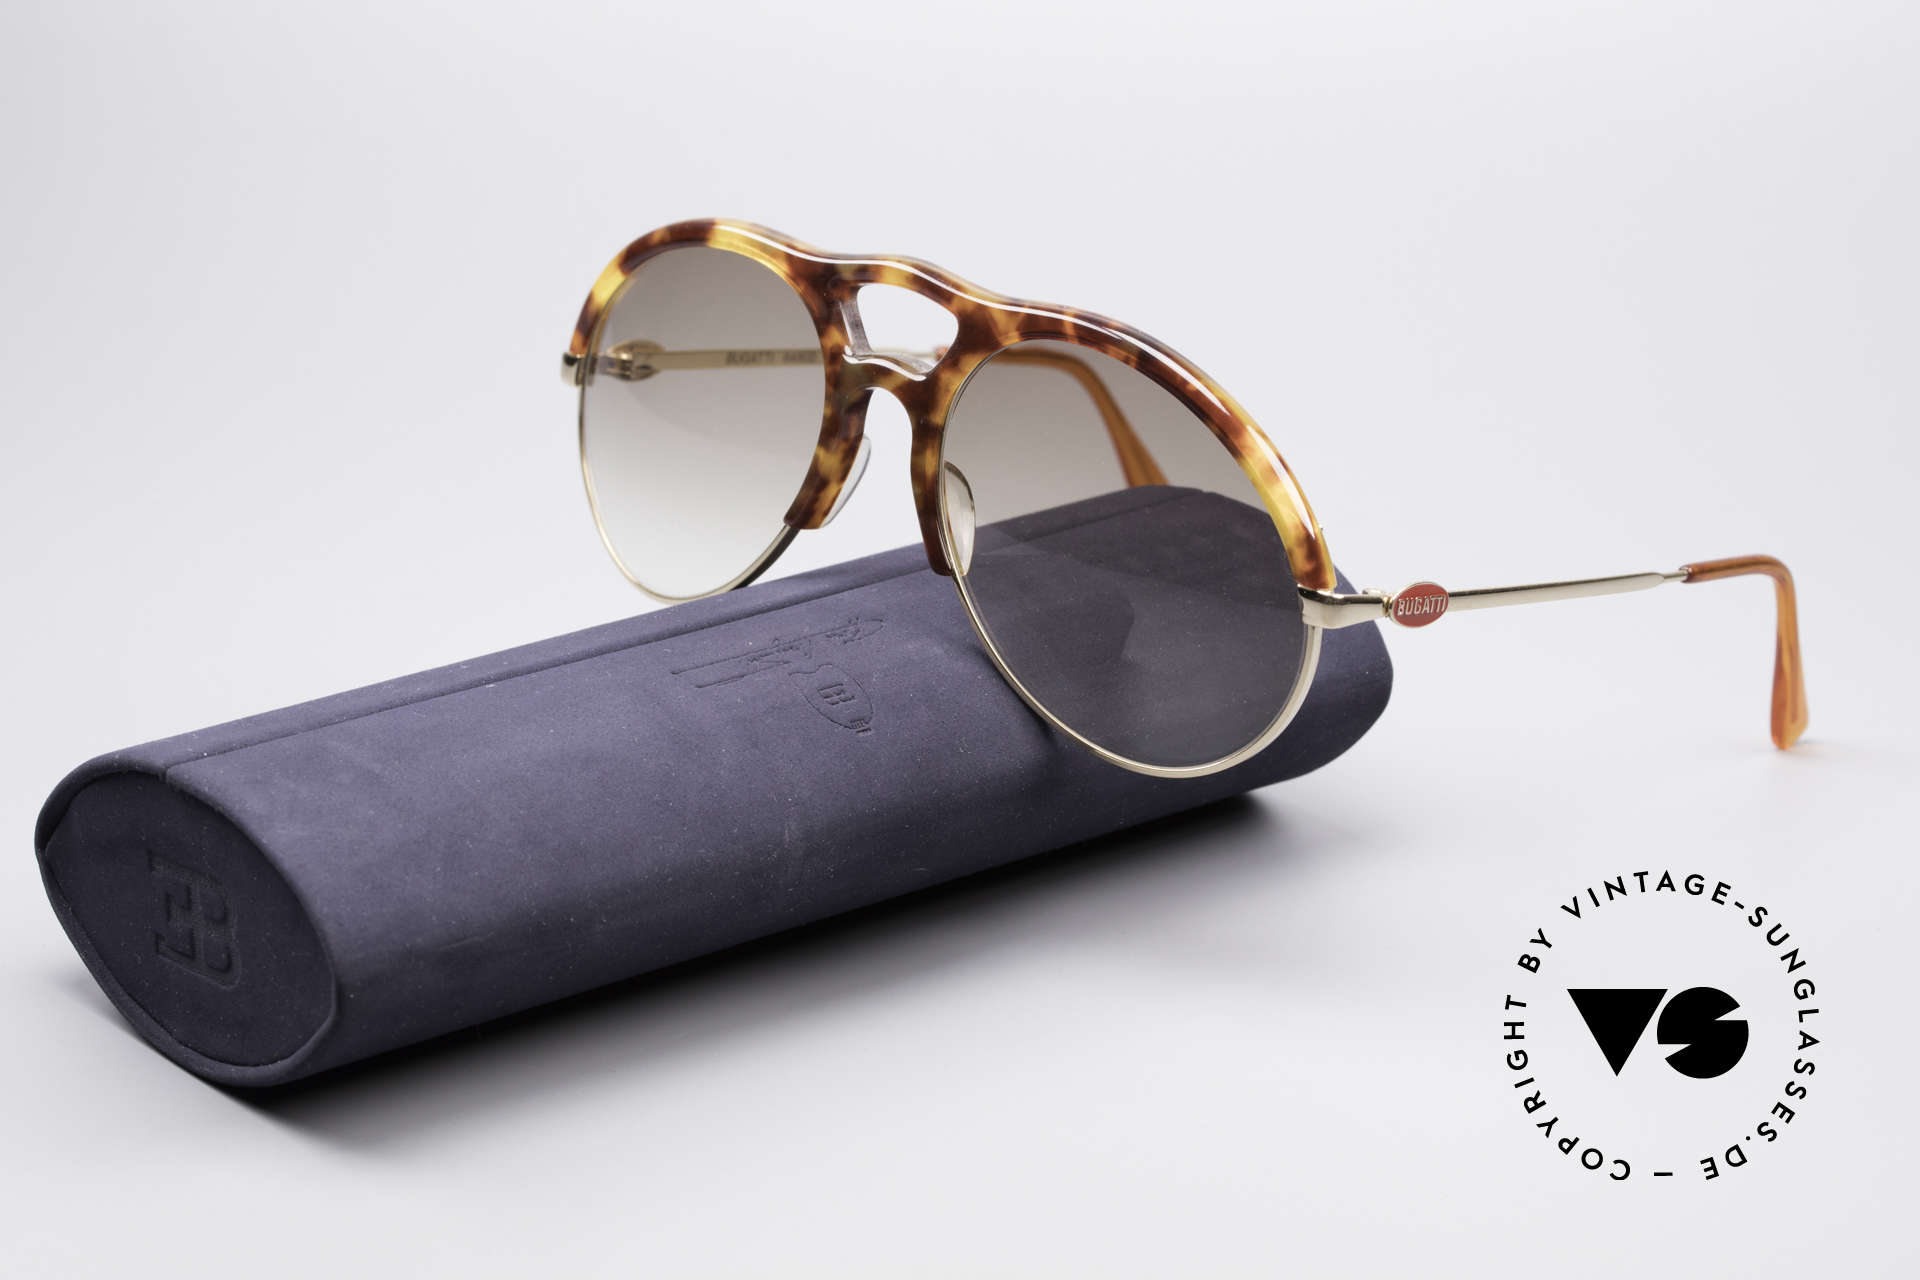 Bugatti 64900 Tortoise Optic 80's Glasses, Size: large, Made for Men